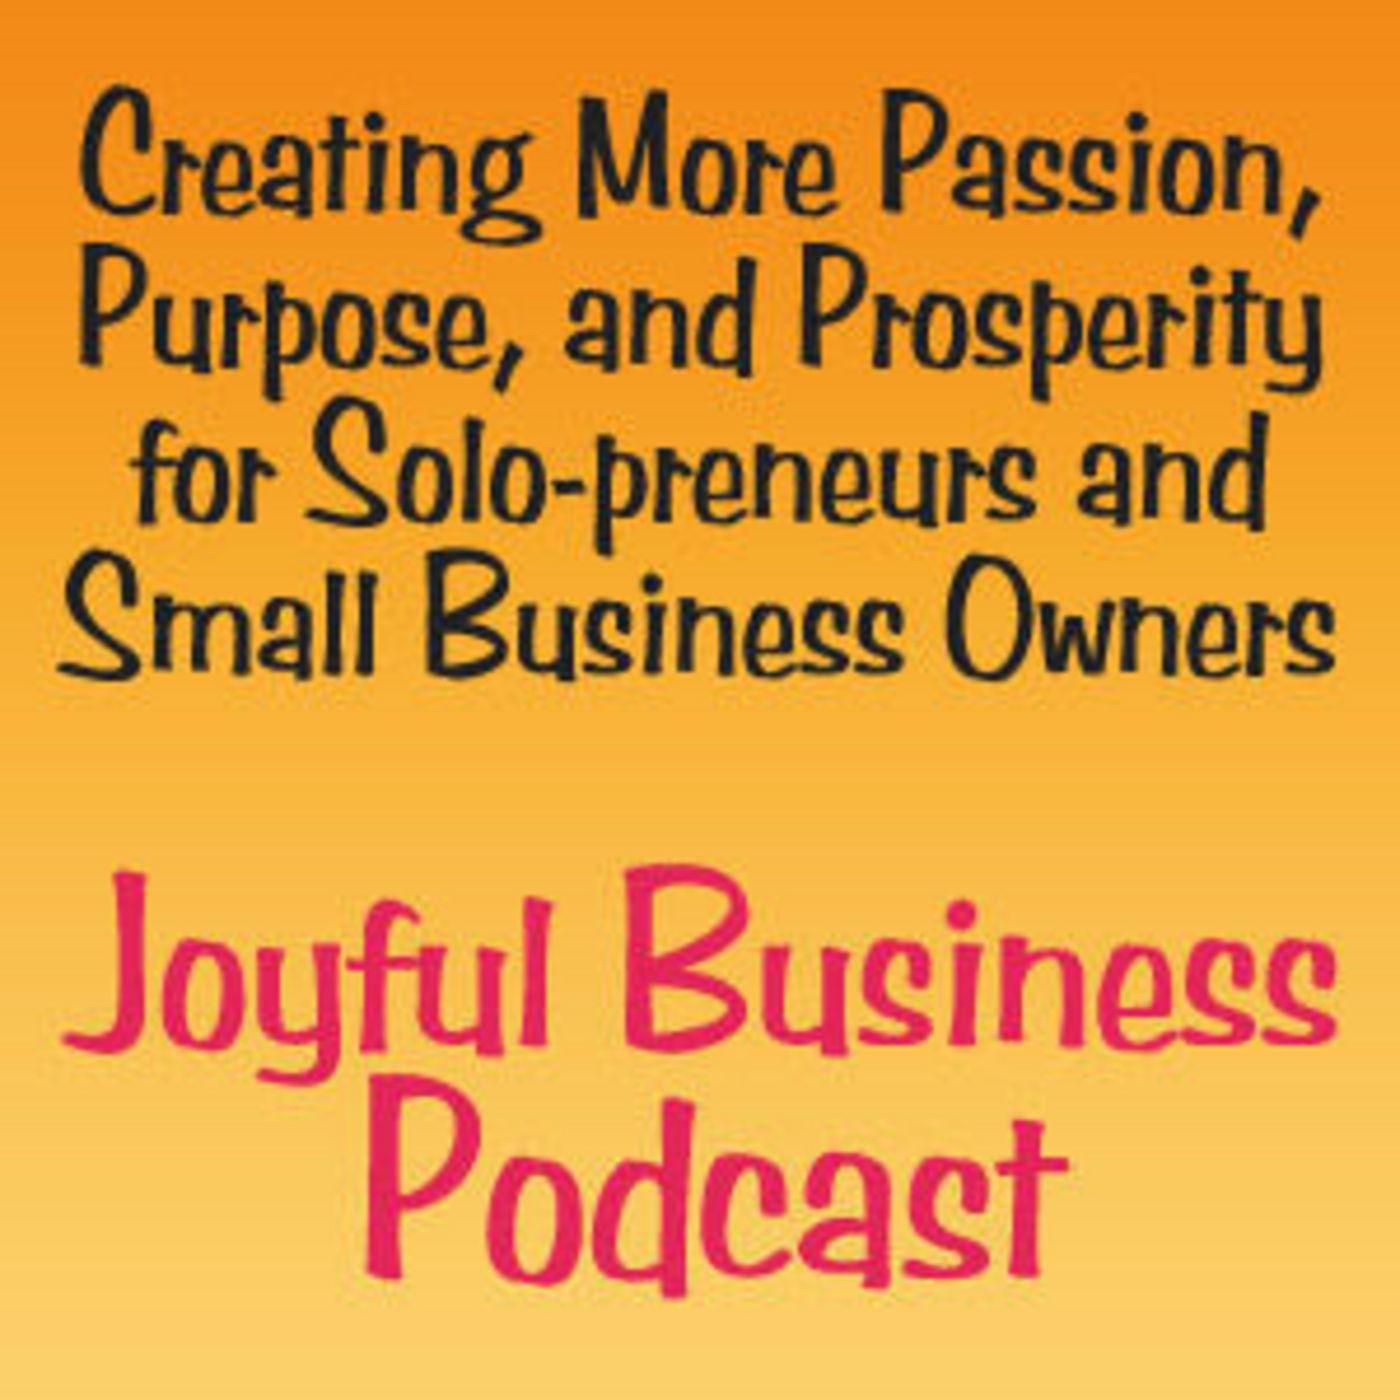 <![CDATA[Joyful Business]]>